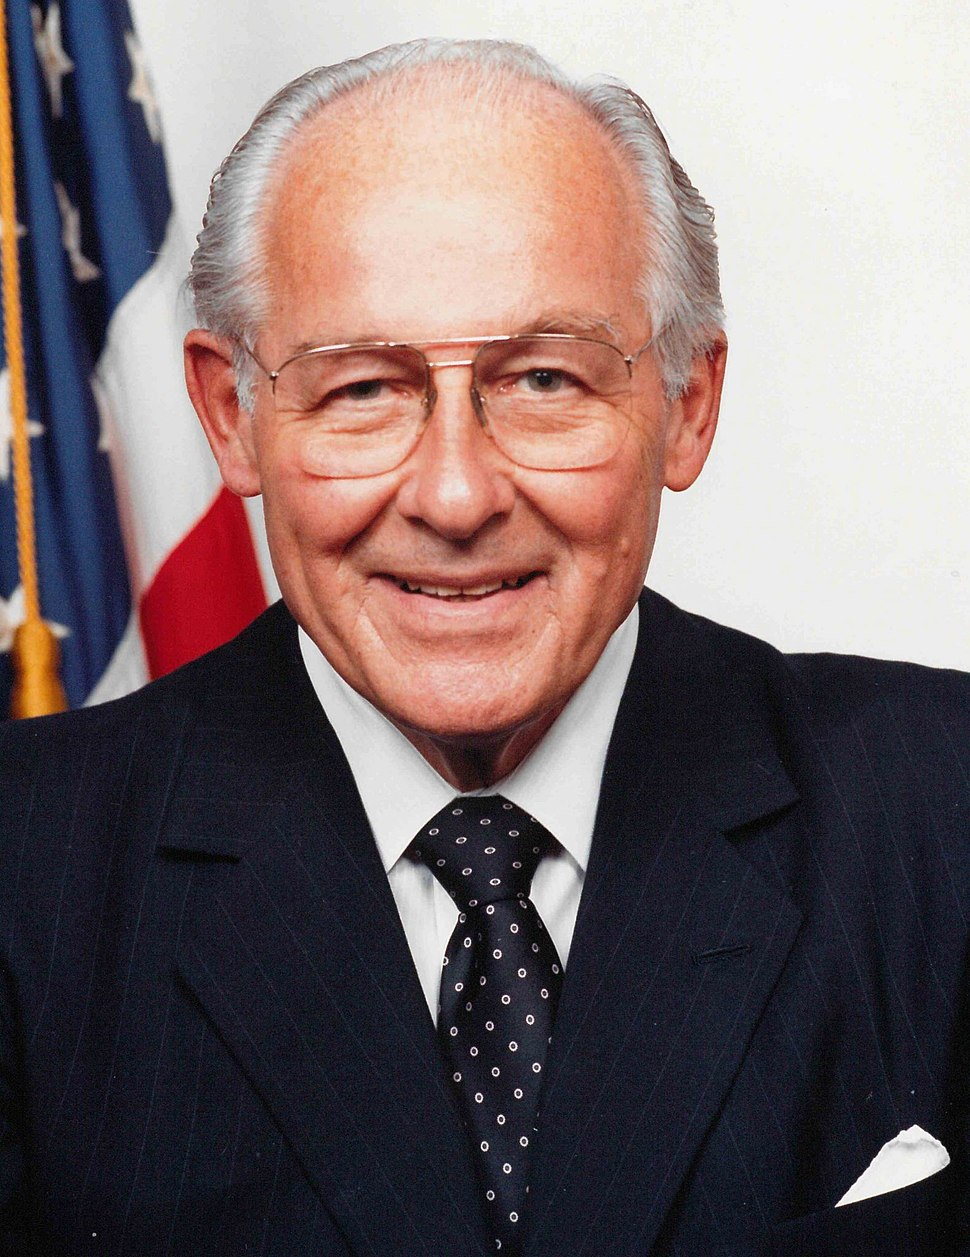 RobertHMichelCP